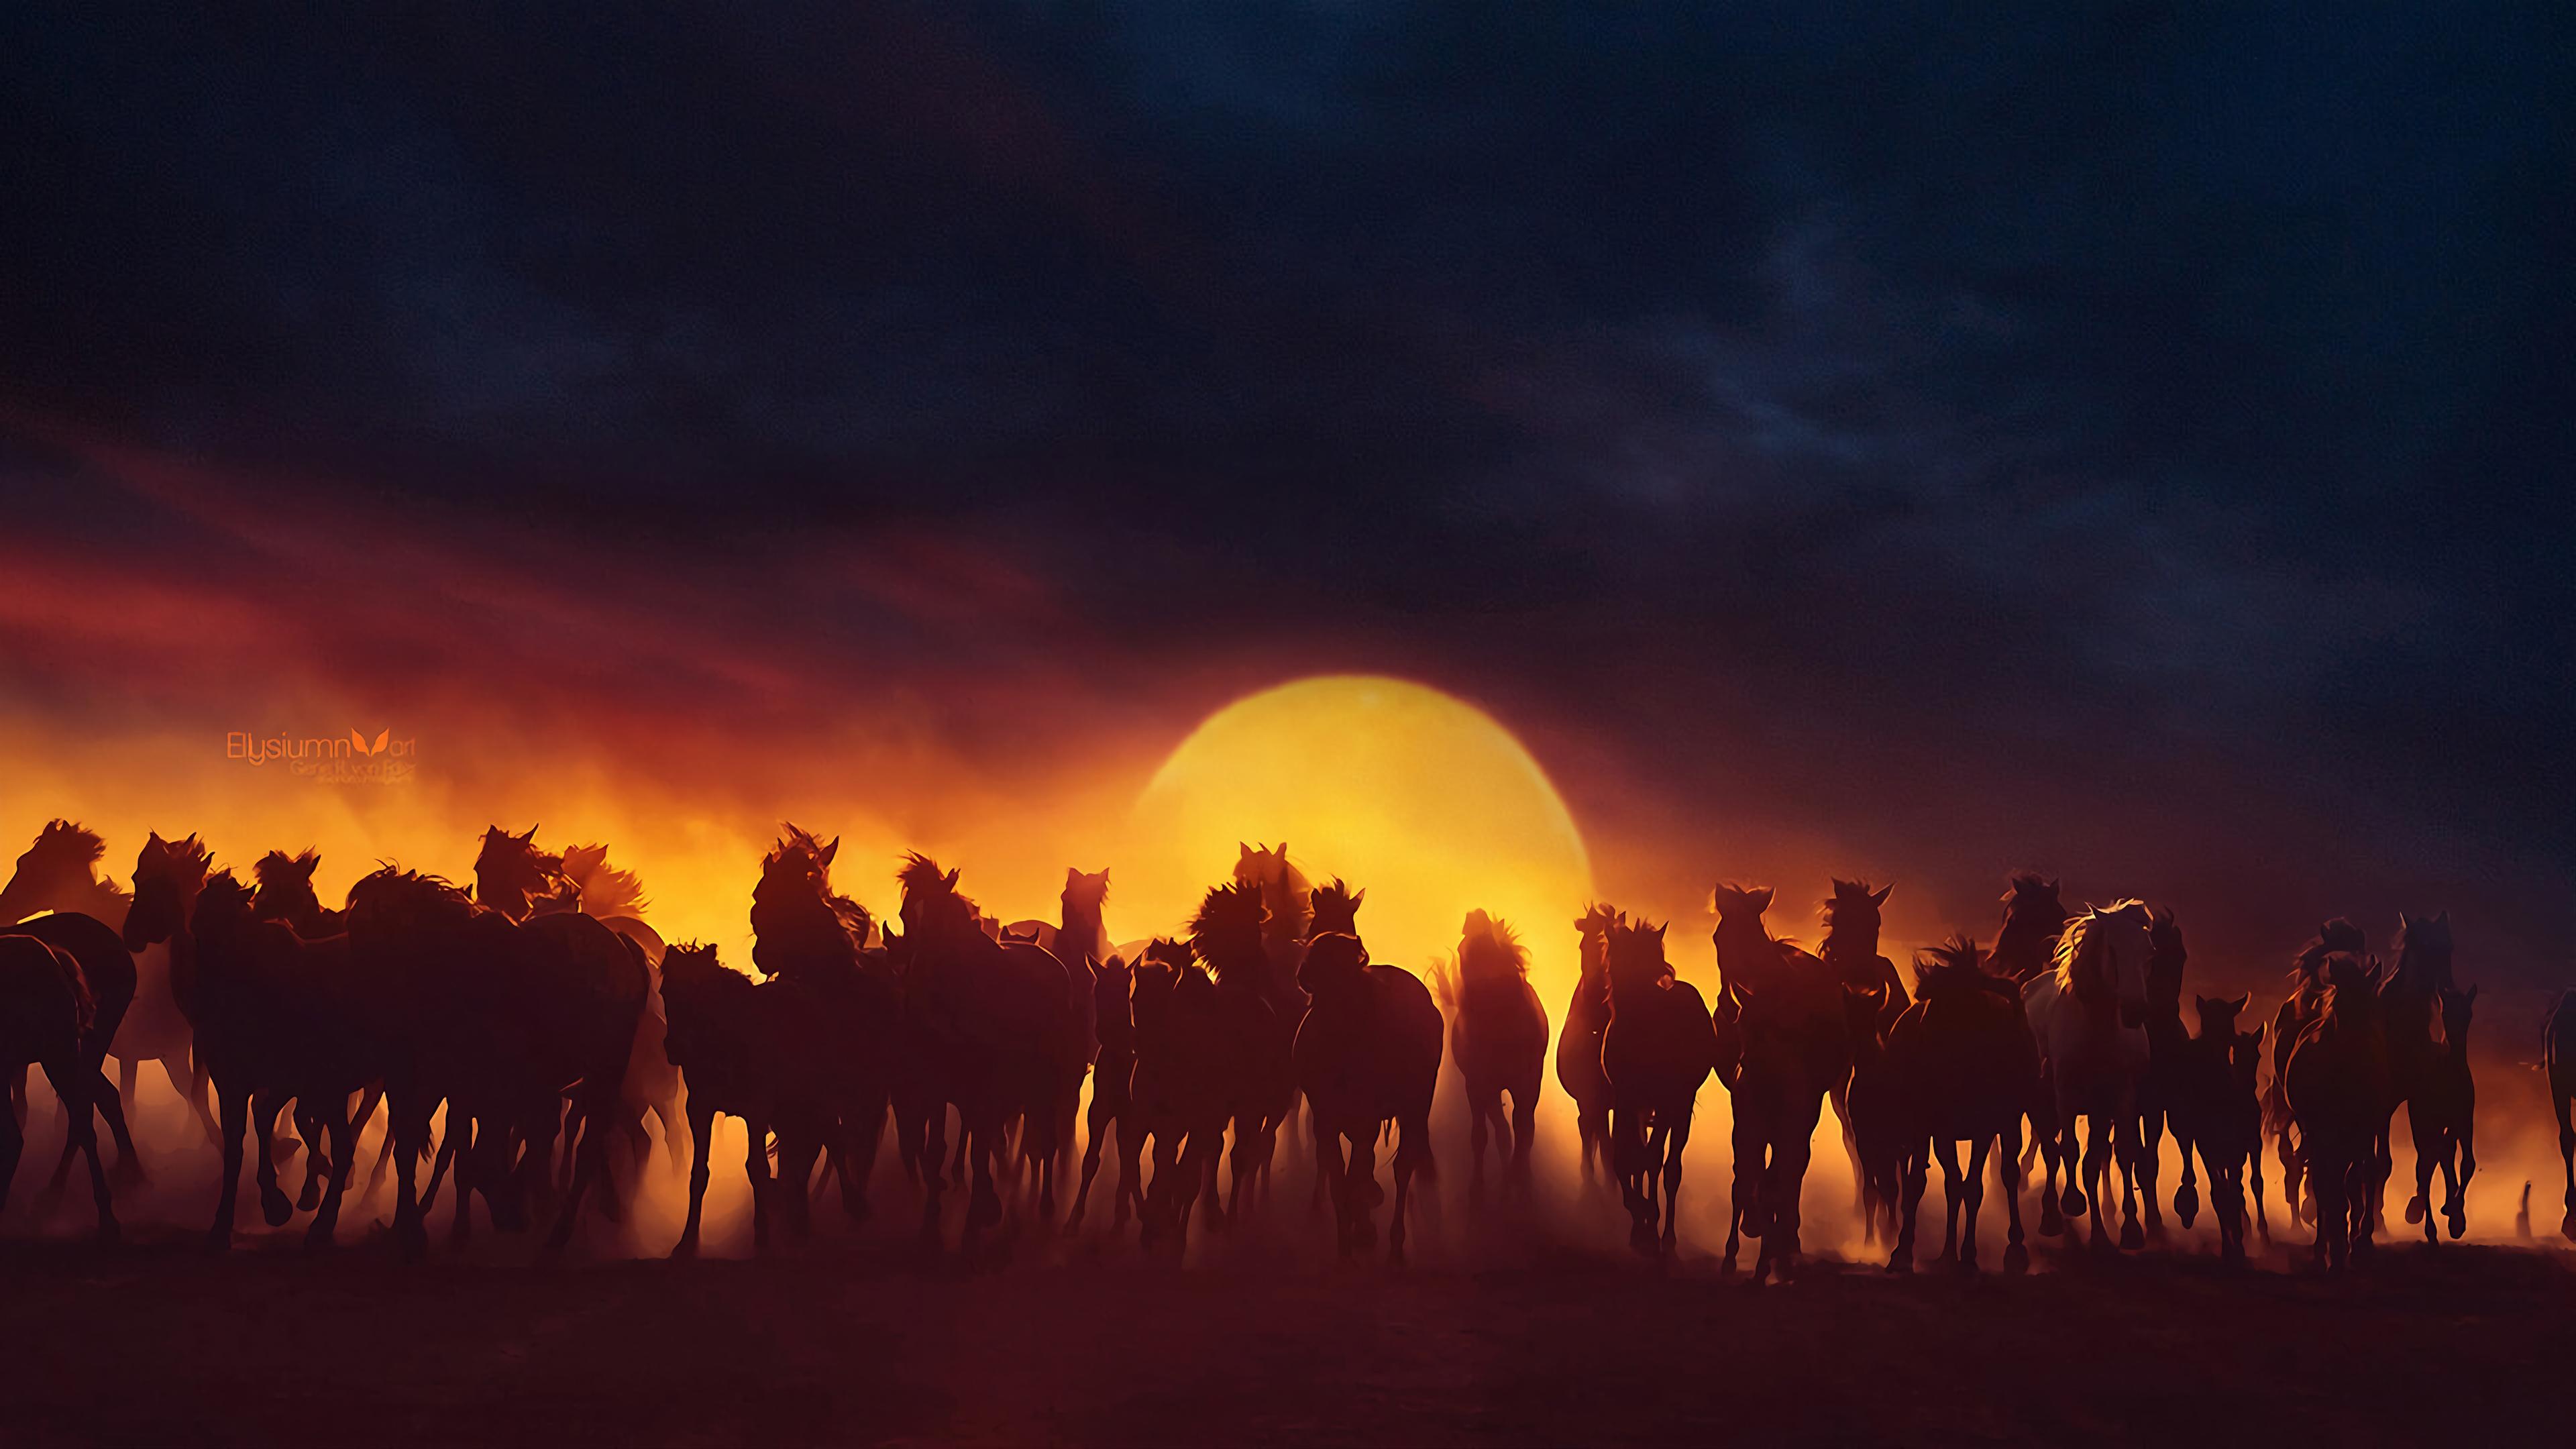 group of horses running 1574938119 - Group Of Horses Running -